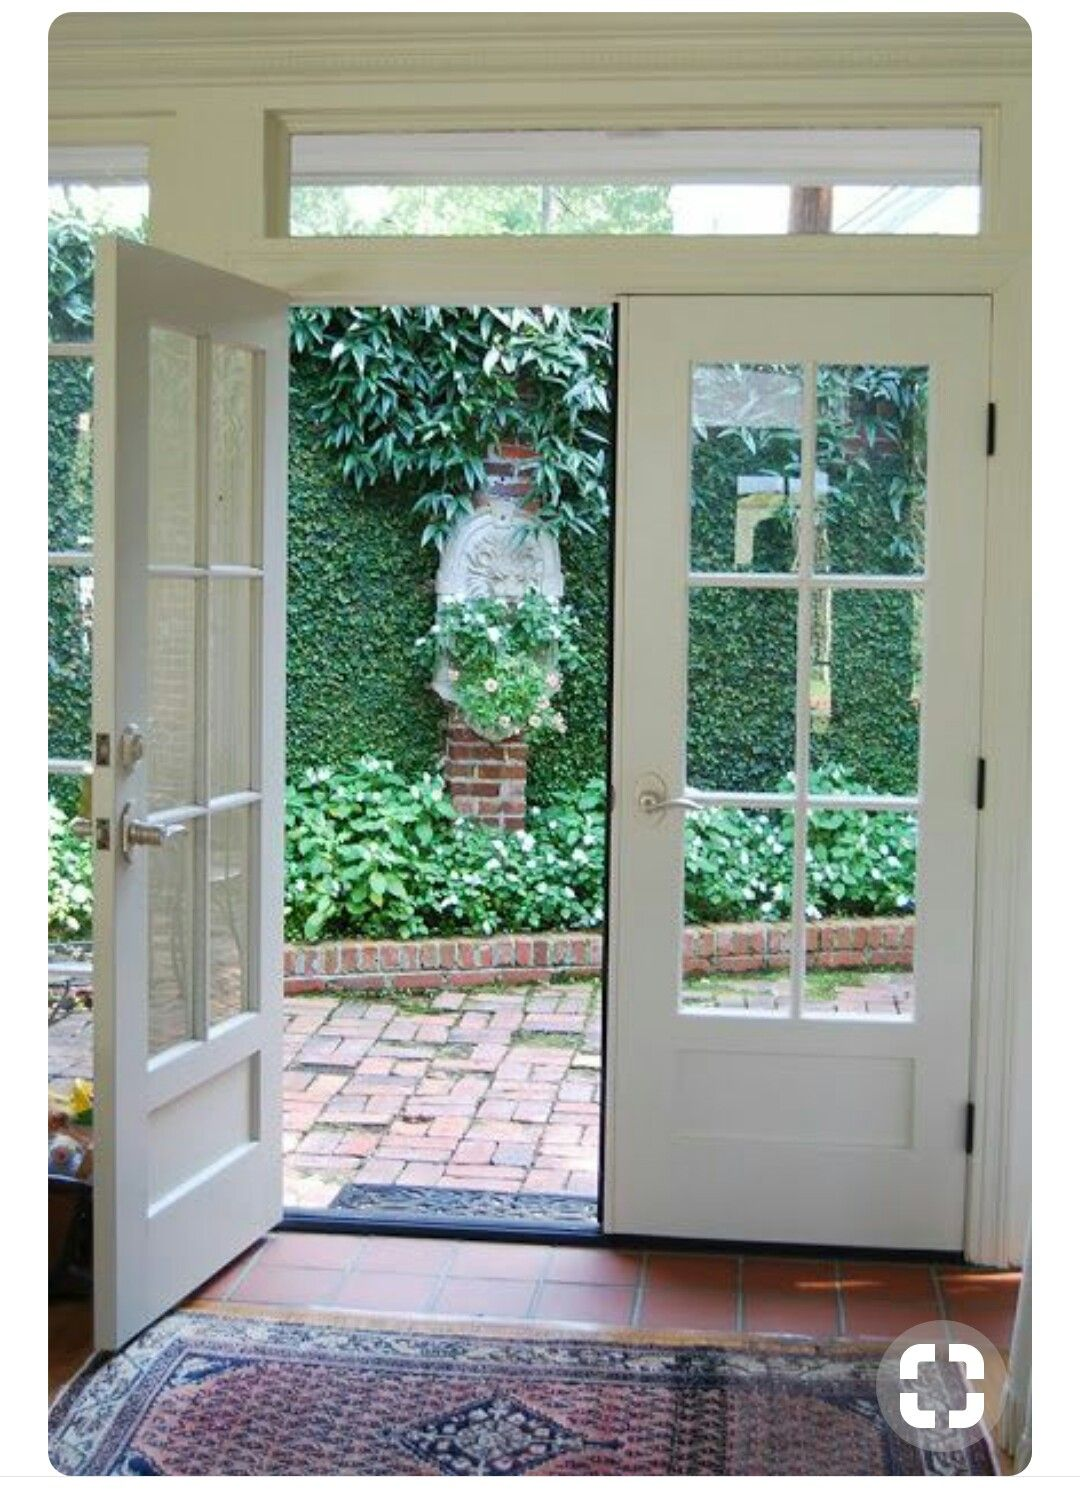 Pin By Tania On Casas Victorian Patio Doors French Doors Patio Exterior Door Styles